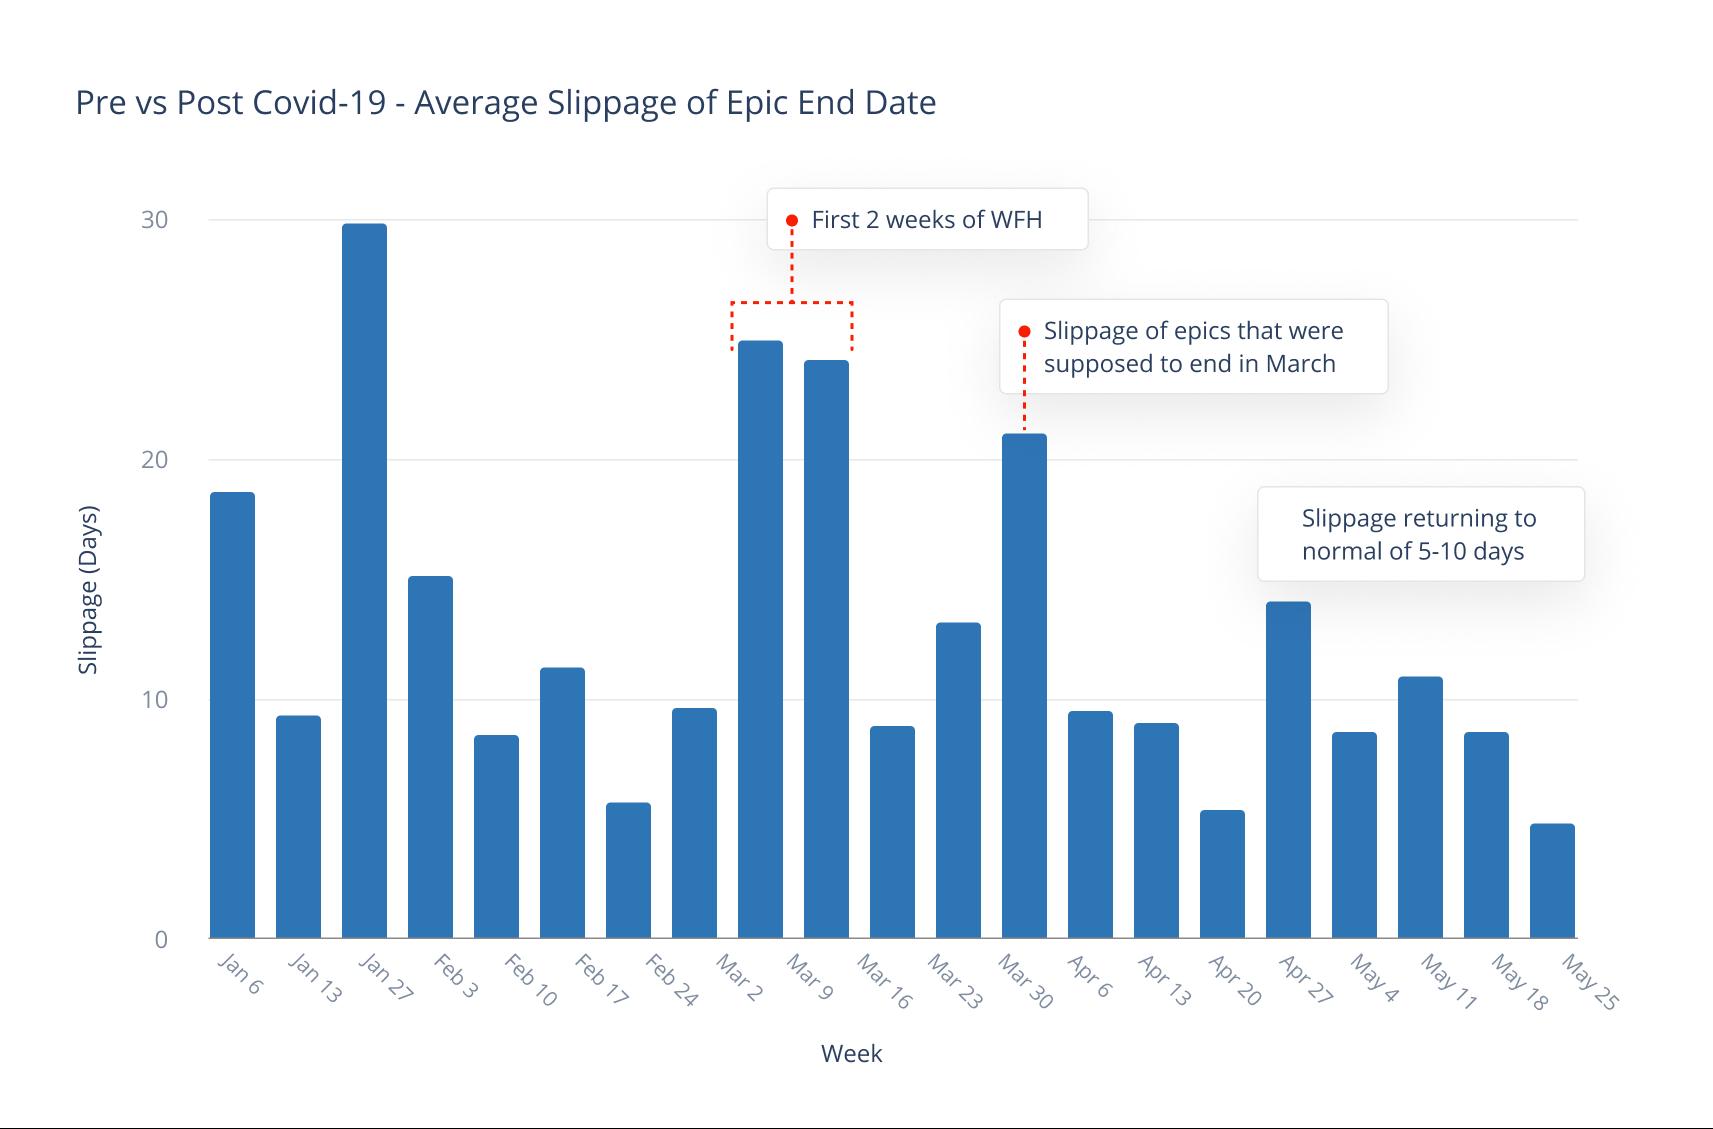 Pre vs Post Covid-19 - Average Slippage of Epic End Date